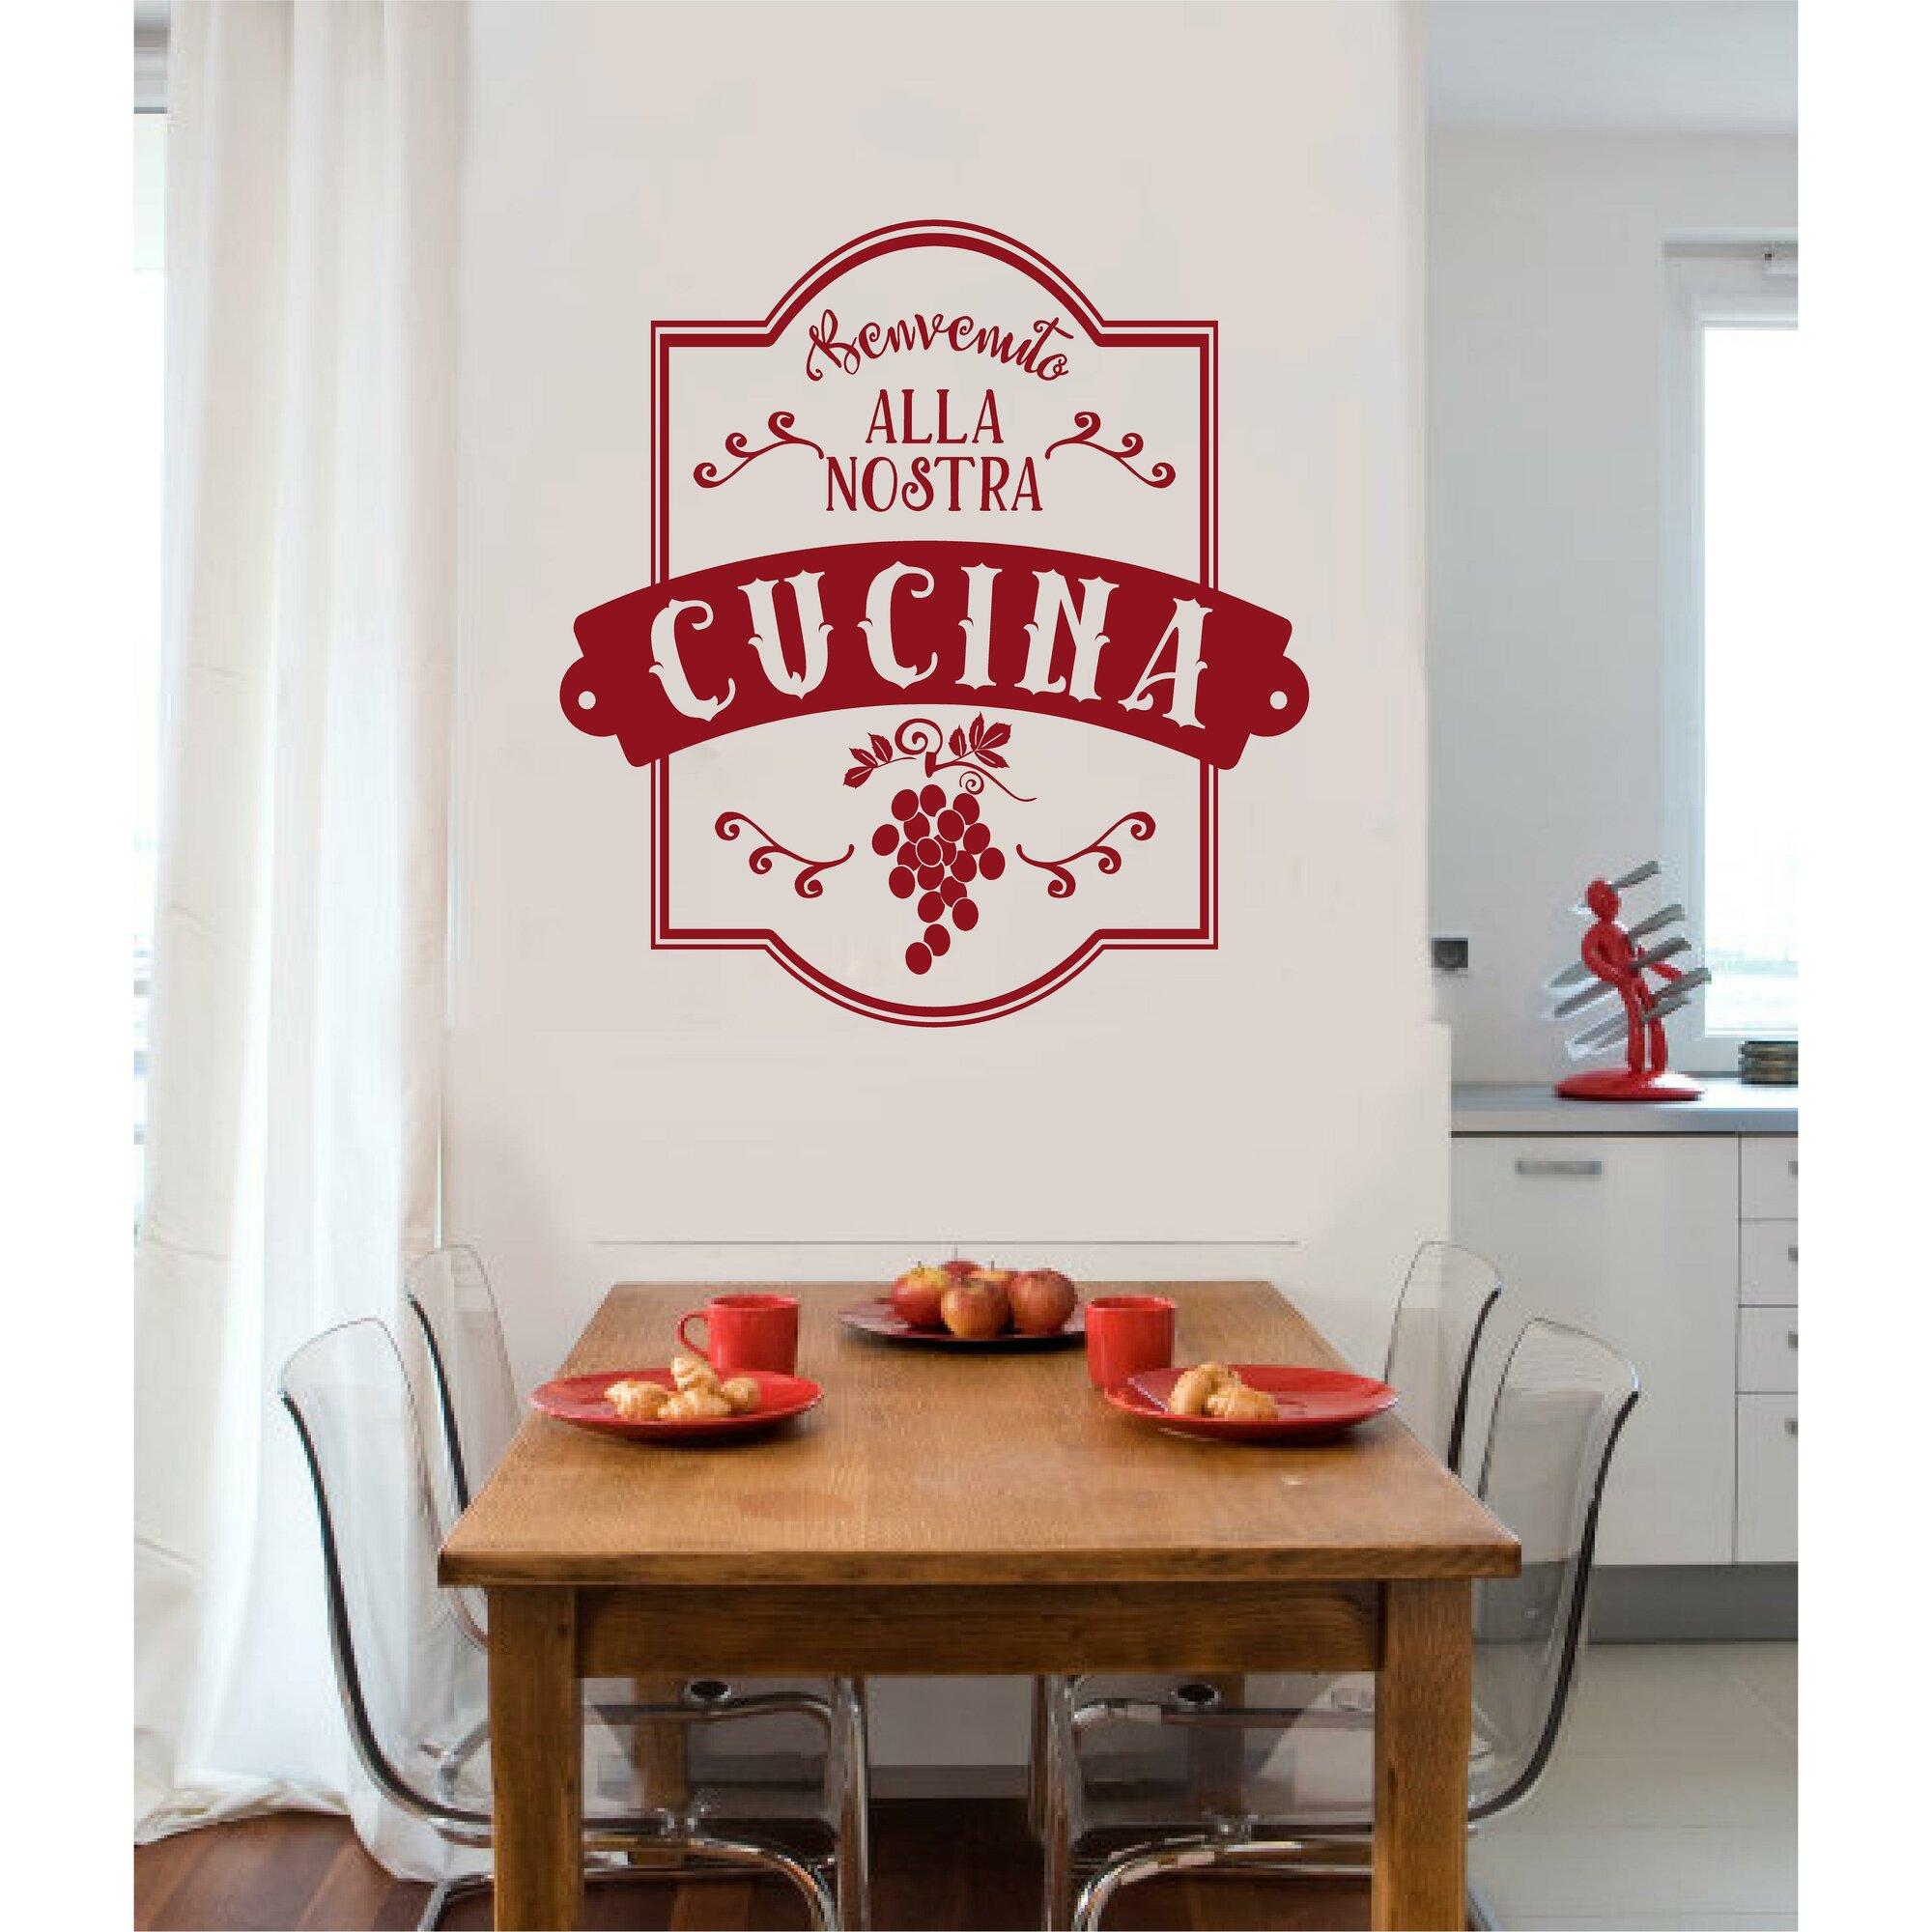 benvenuto alla nostra cucina italian vinyl word lettering kitchen wall decal